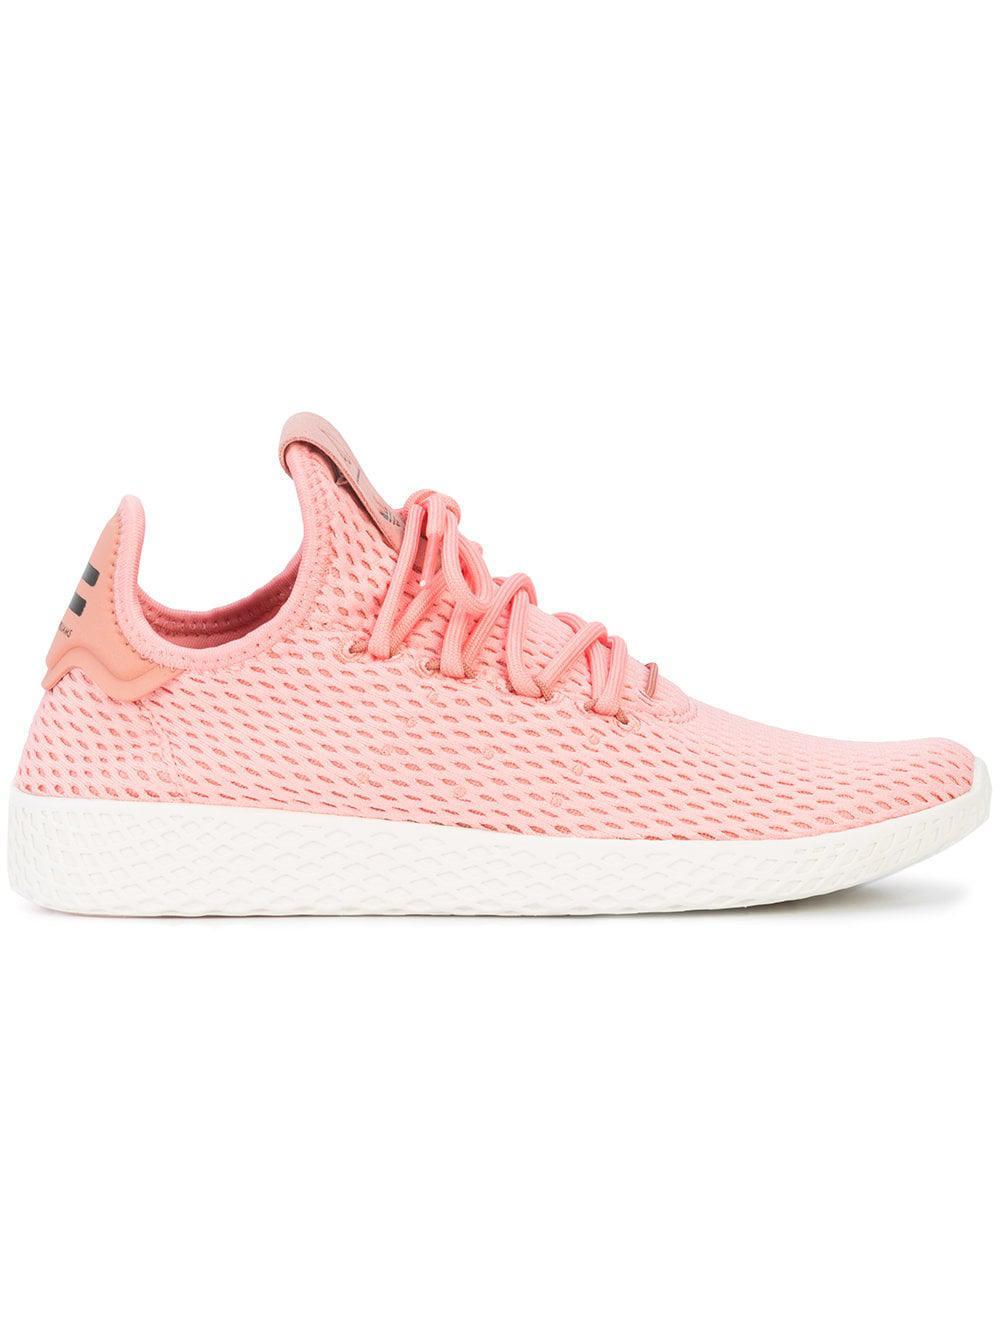 928229787 adidas Originals Pharrell Williams Tennis Hu Sneakers in Pink for ...